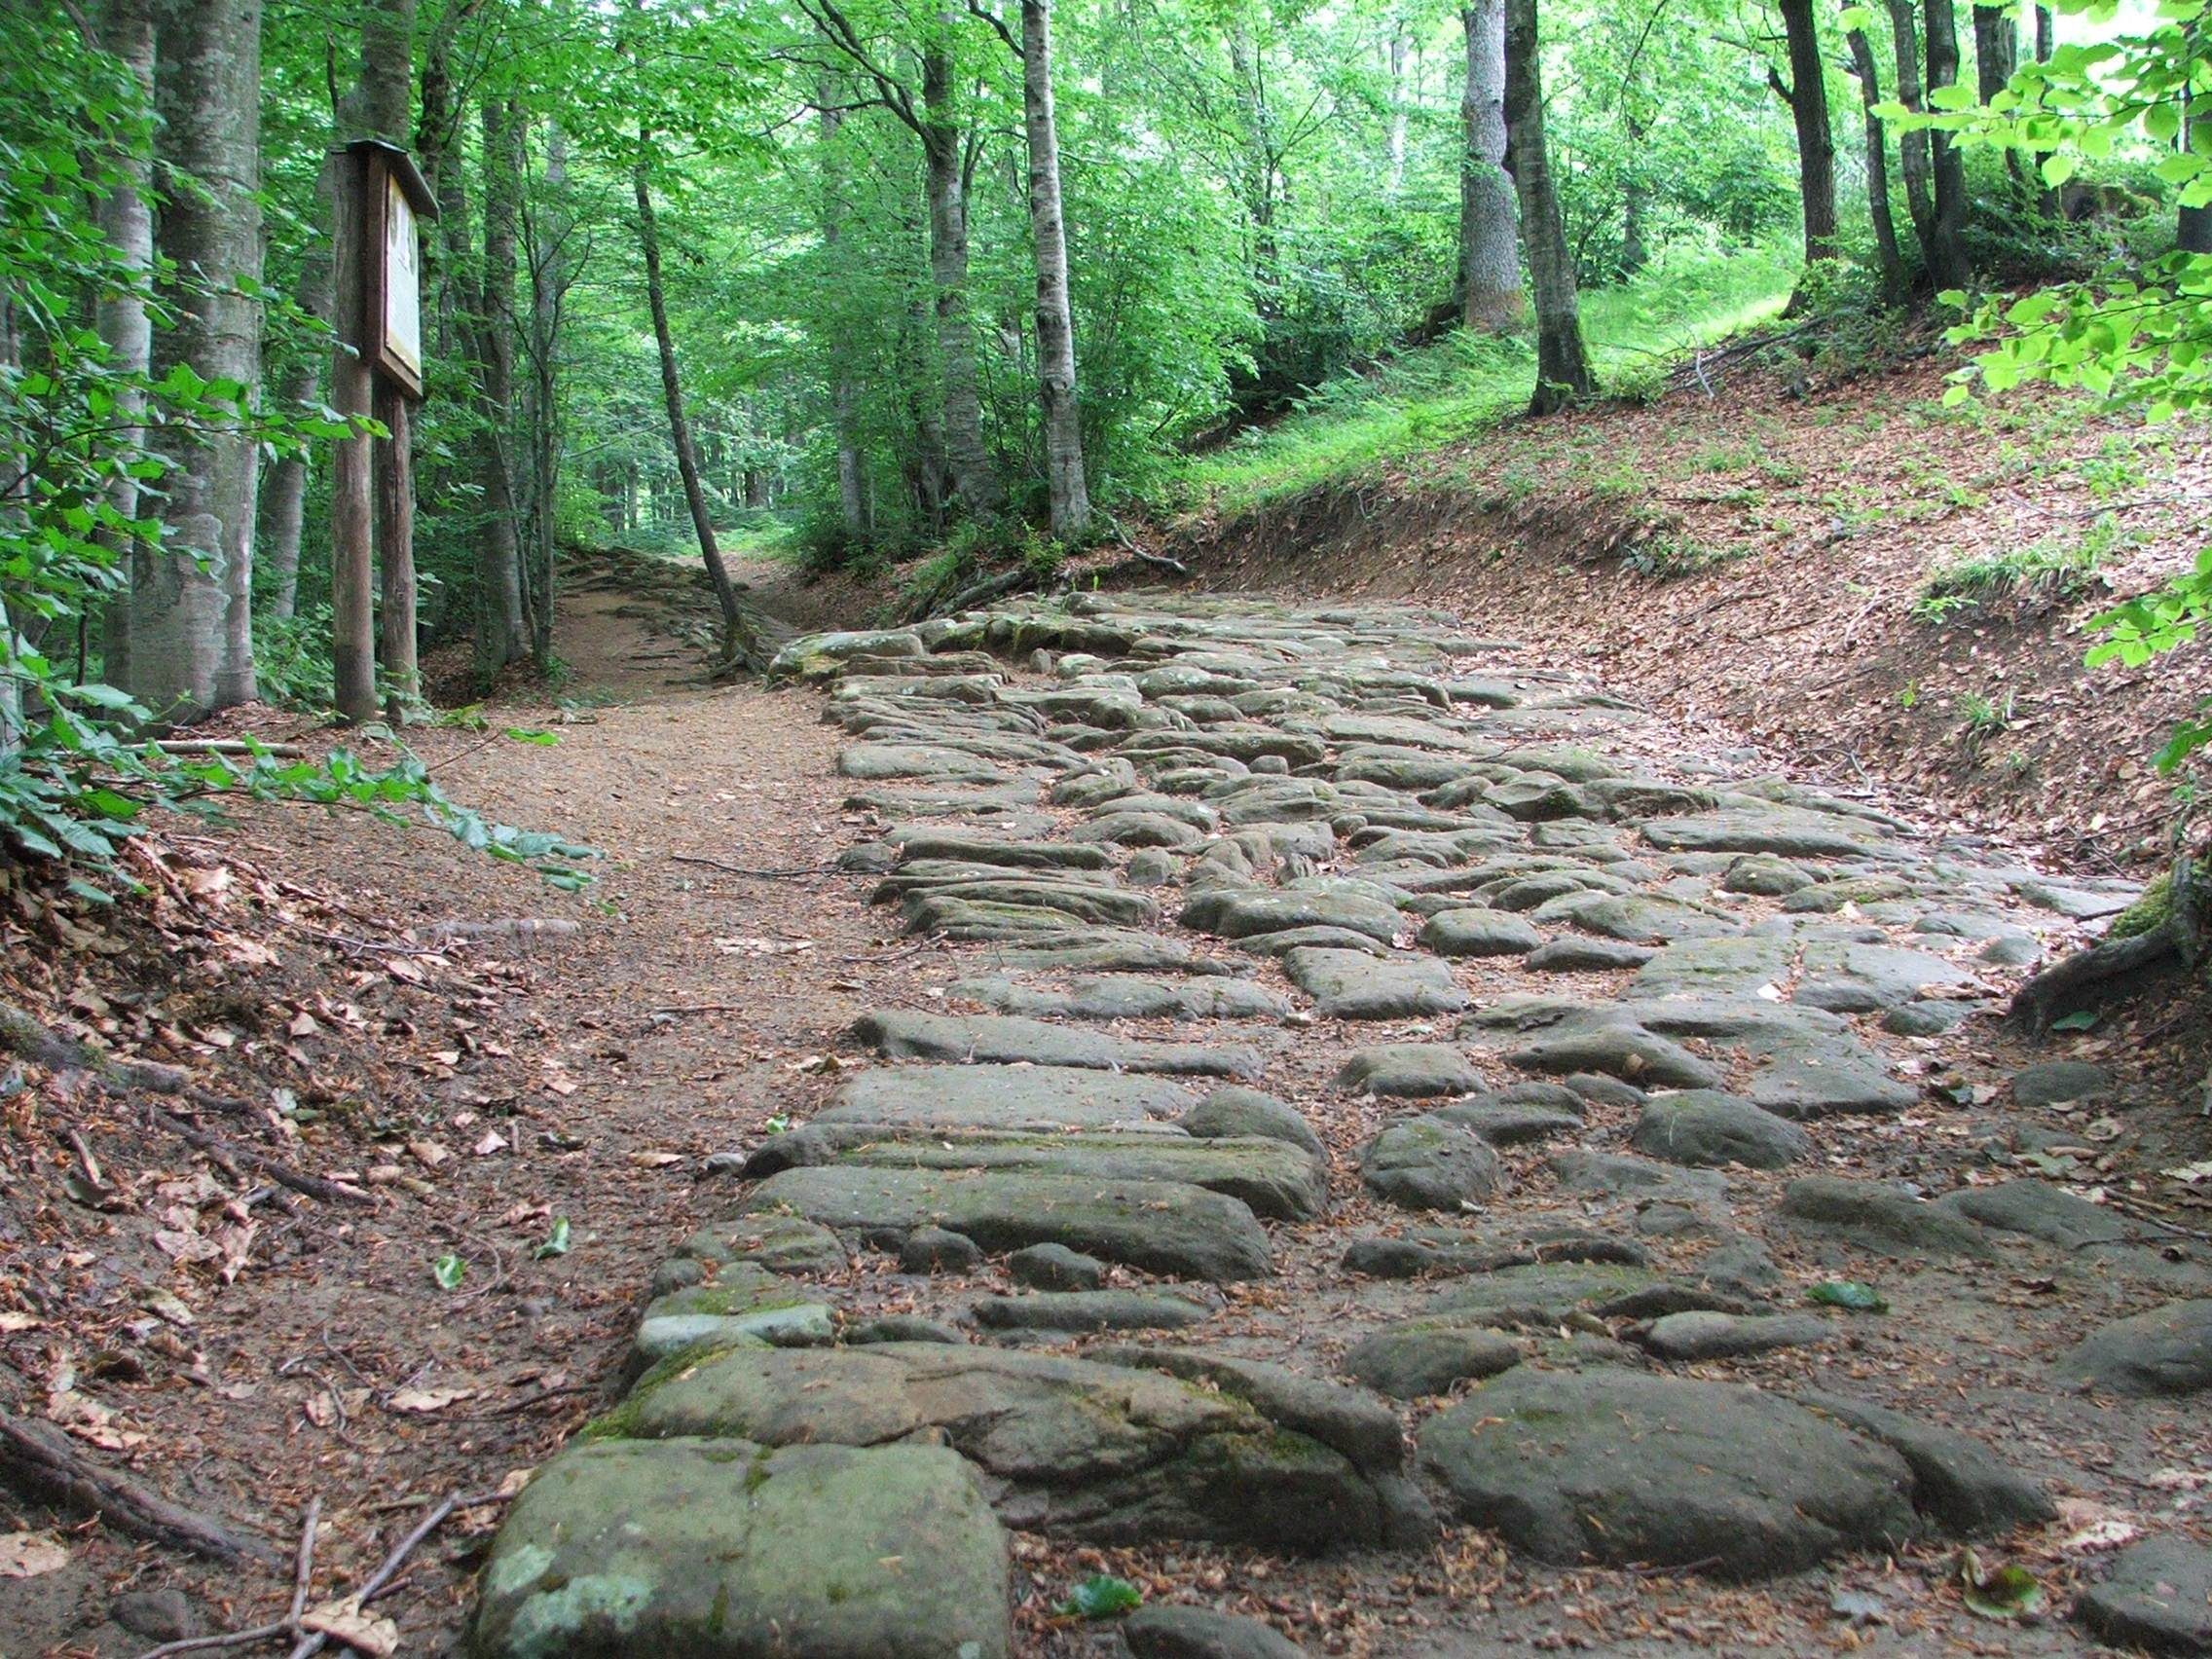 Emilia Romagna Slow | The Way of the Gods